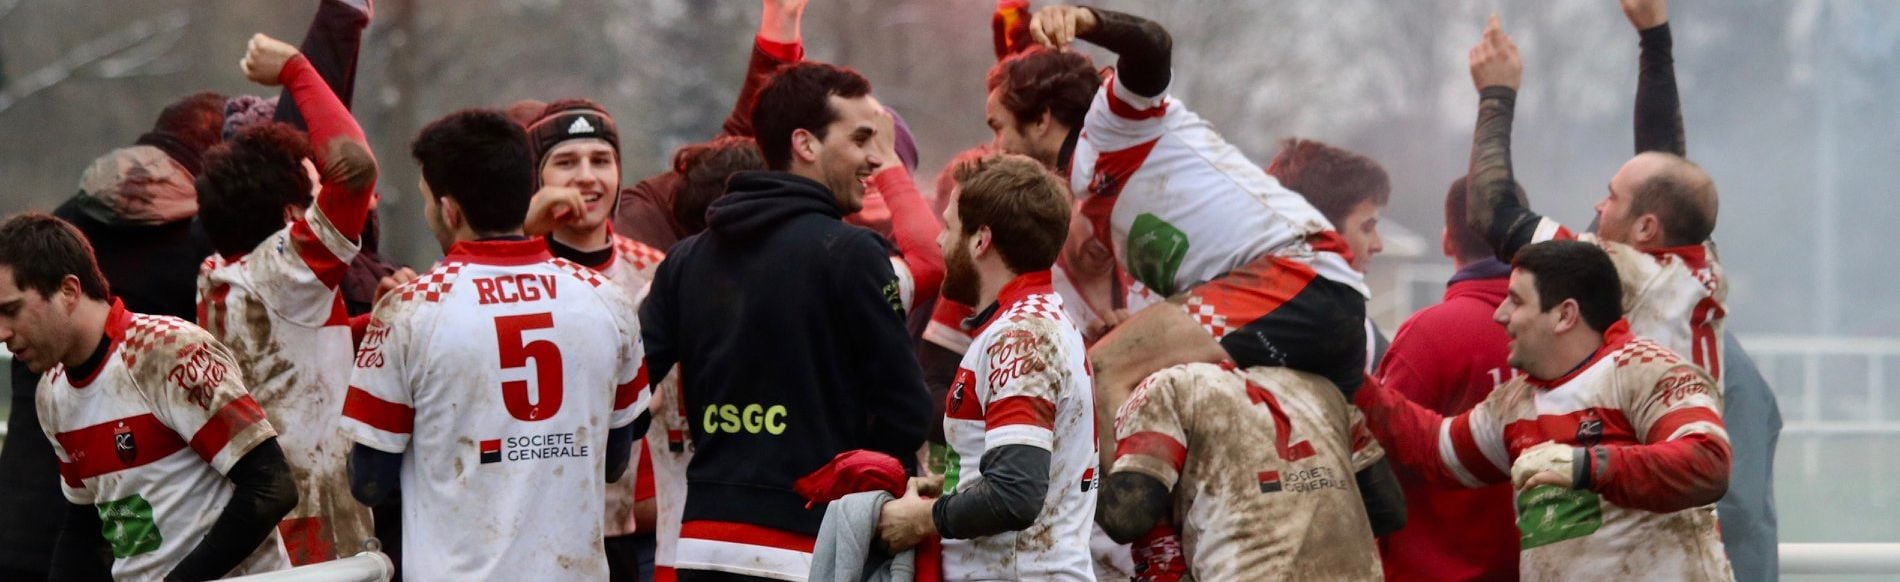 Rugby Club Garches Vaucresson